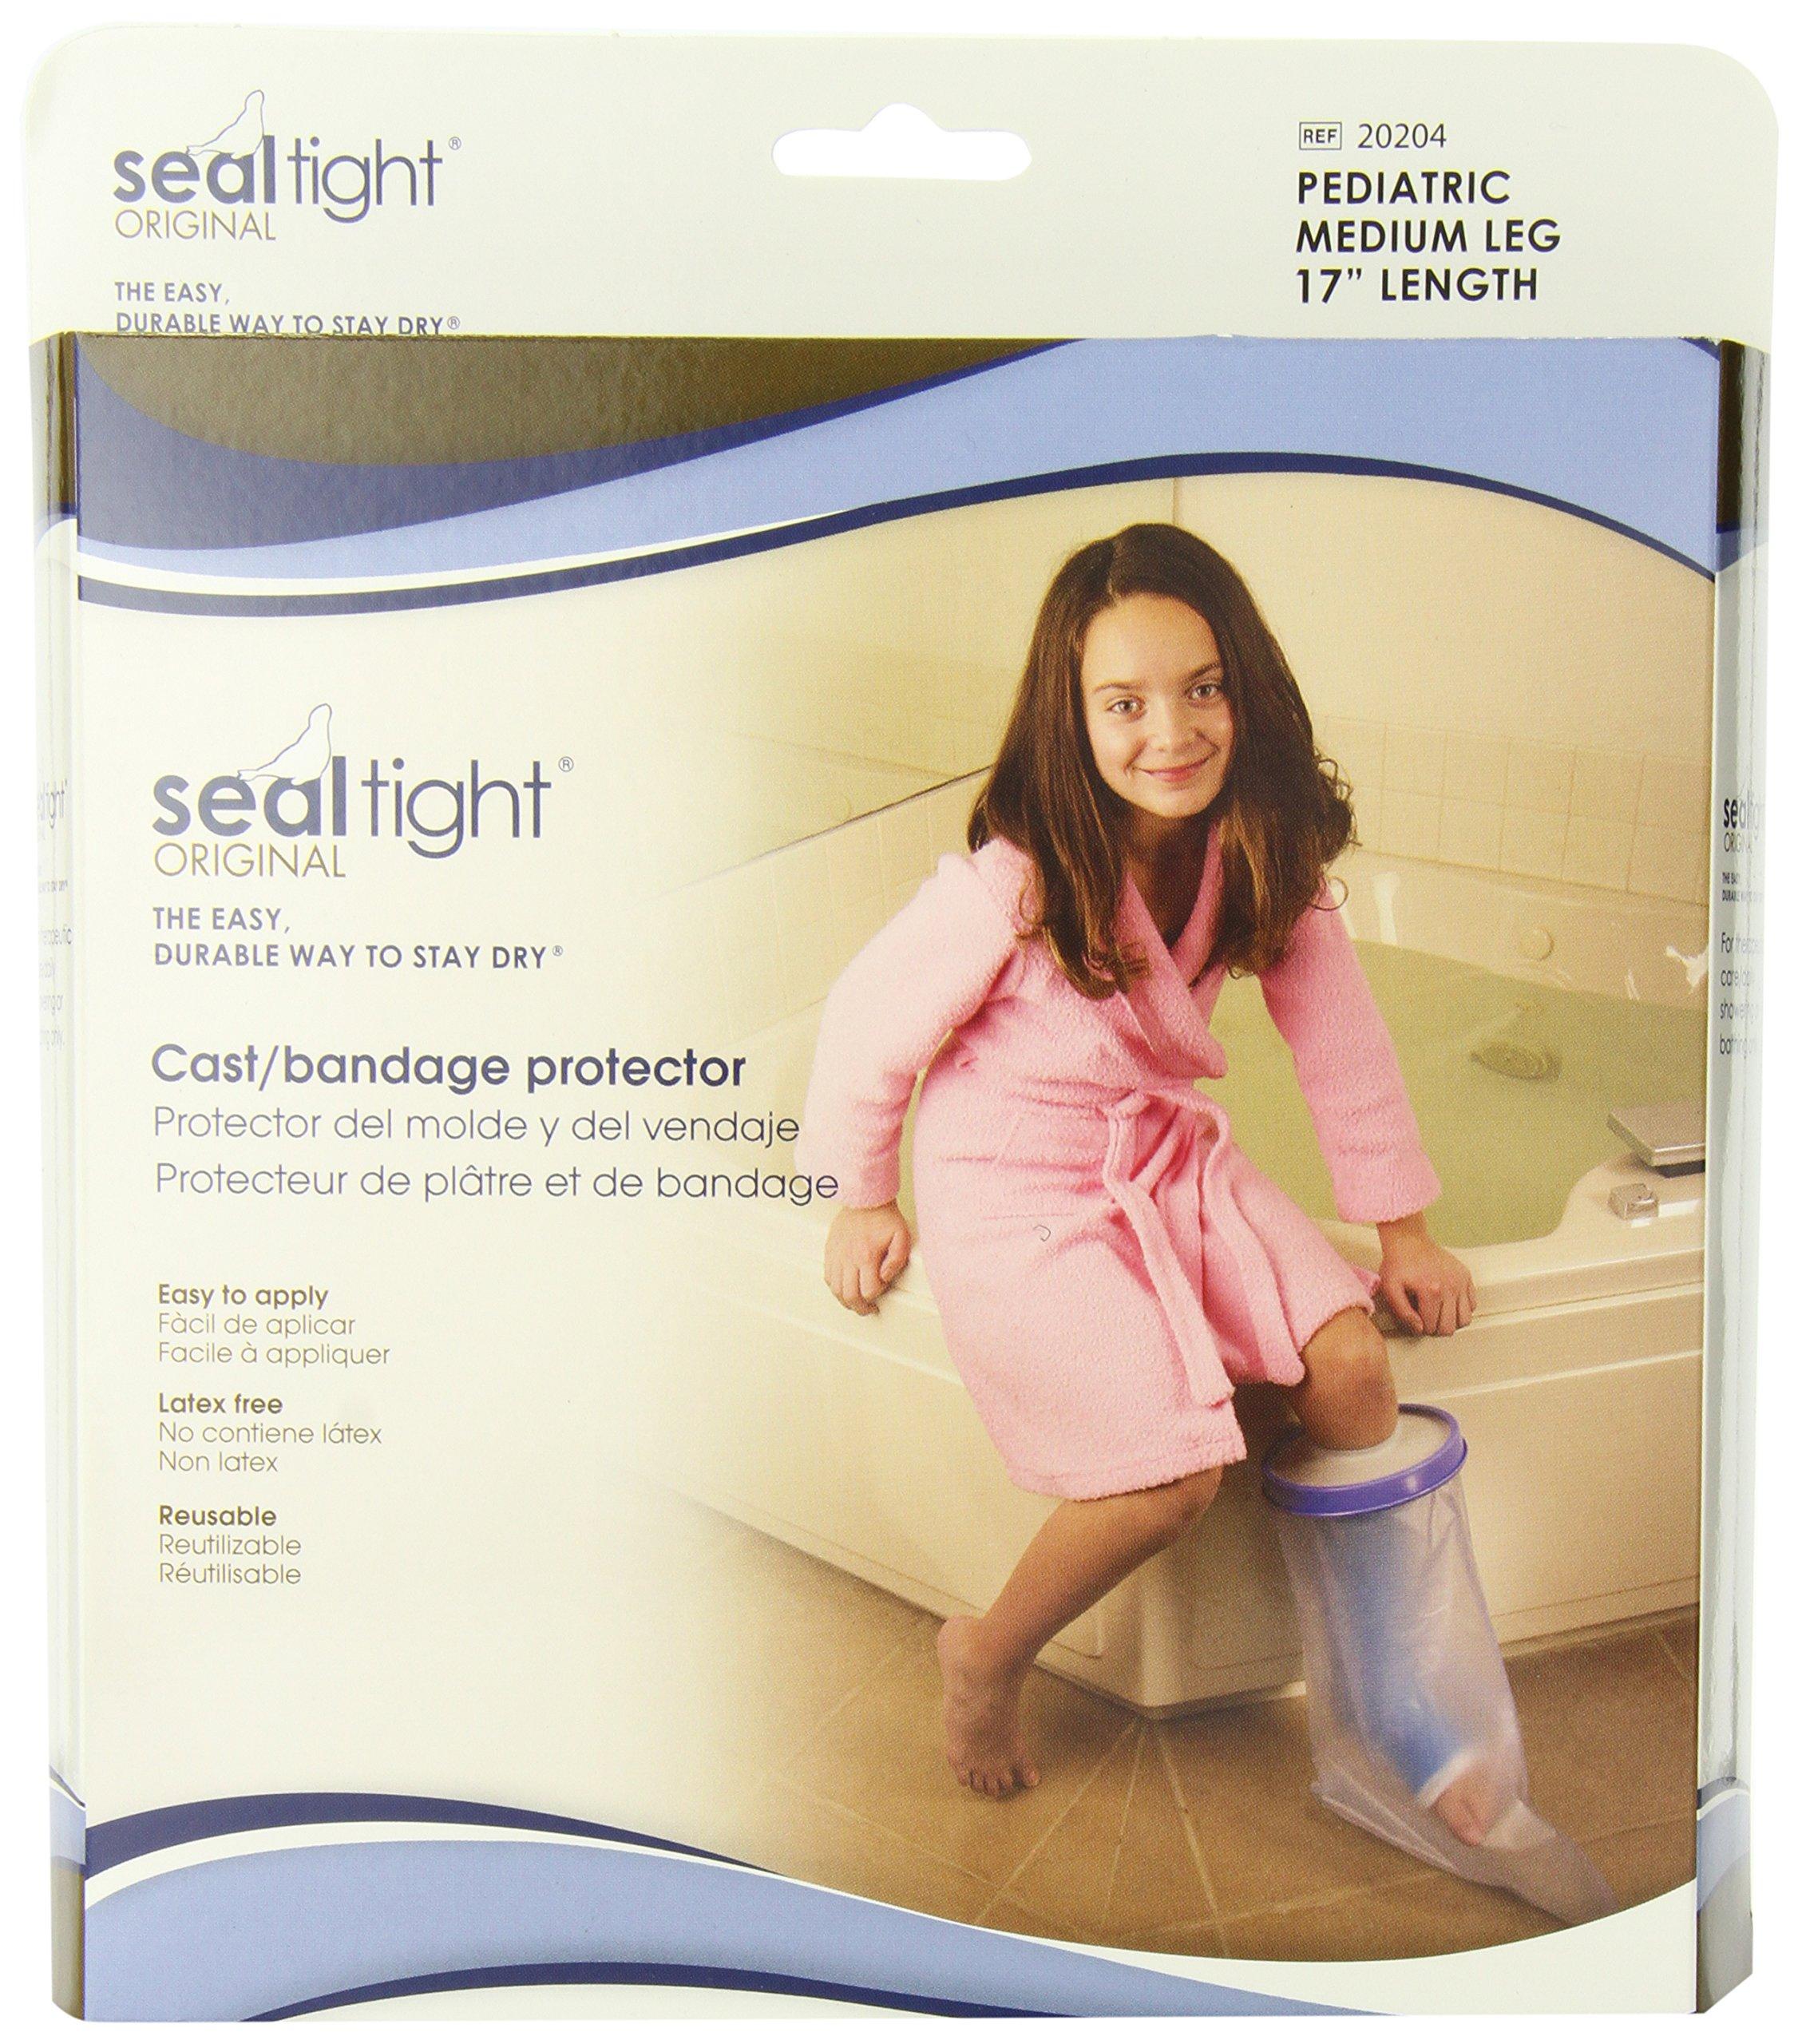 Brownmed SEAL-TIGHT Original Cast and Bandage Protector, Pediatric Medium Leg by Brownmed